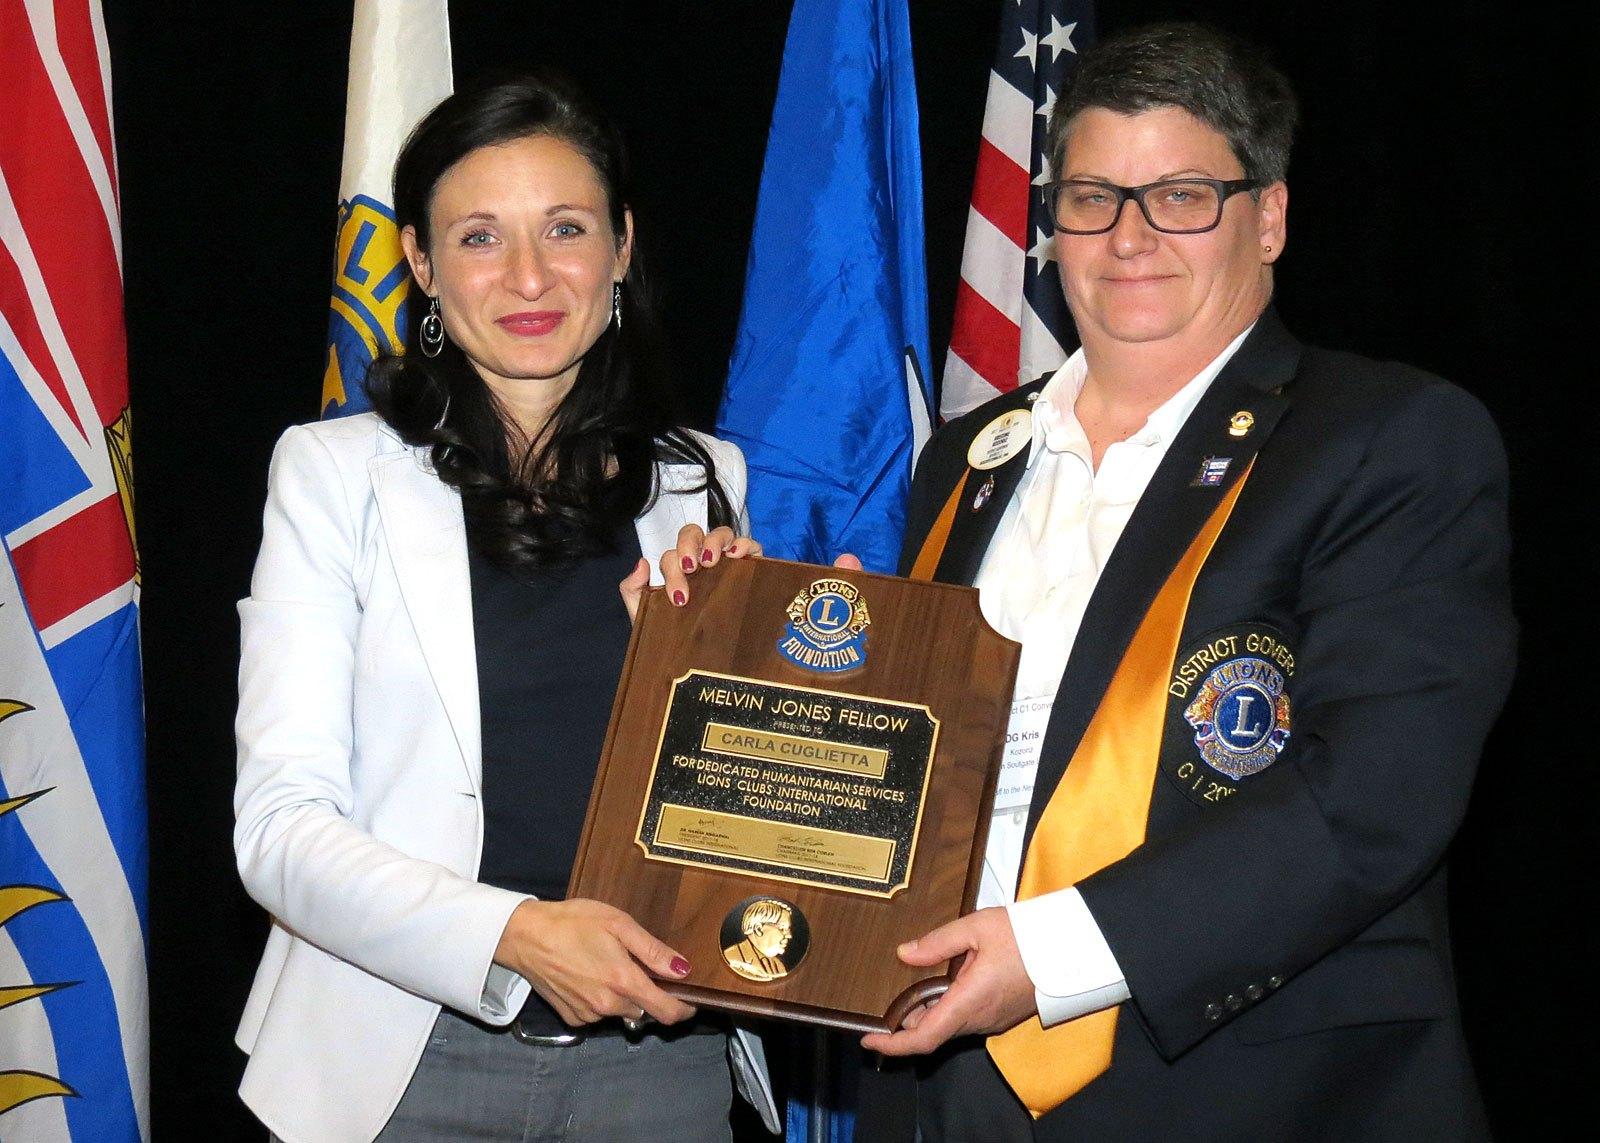 Carla Cuglietta is presented the award for 2017's Citizen of Distinction by DG Kris Kozoriz